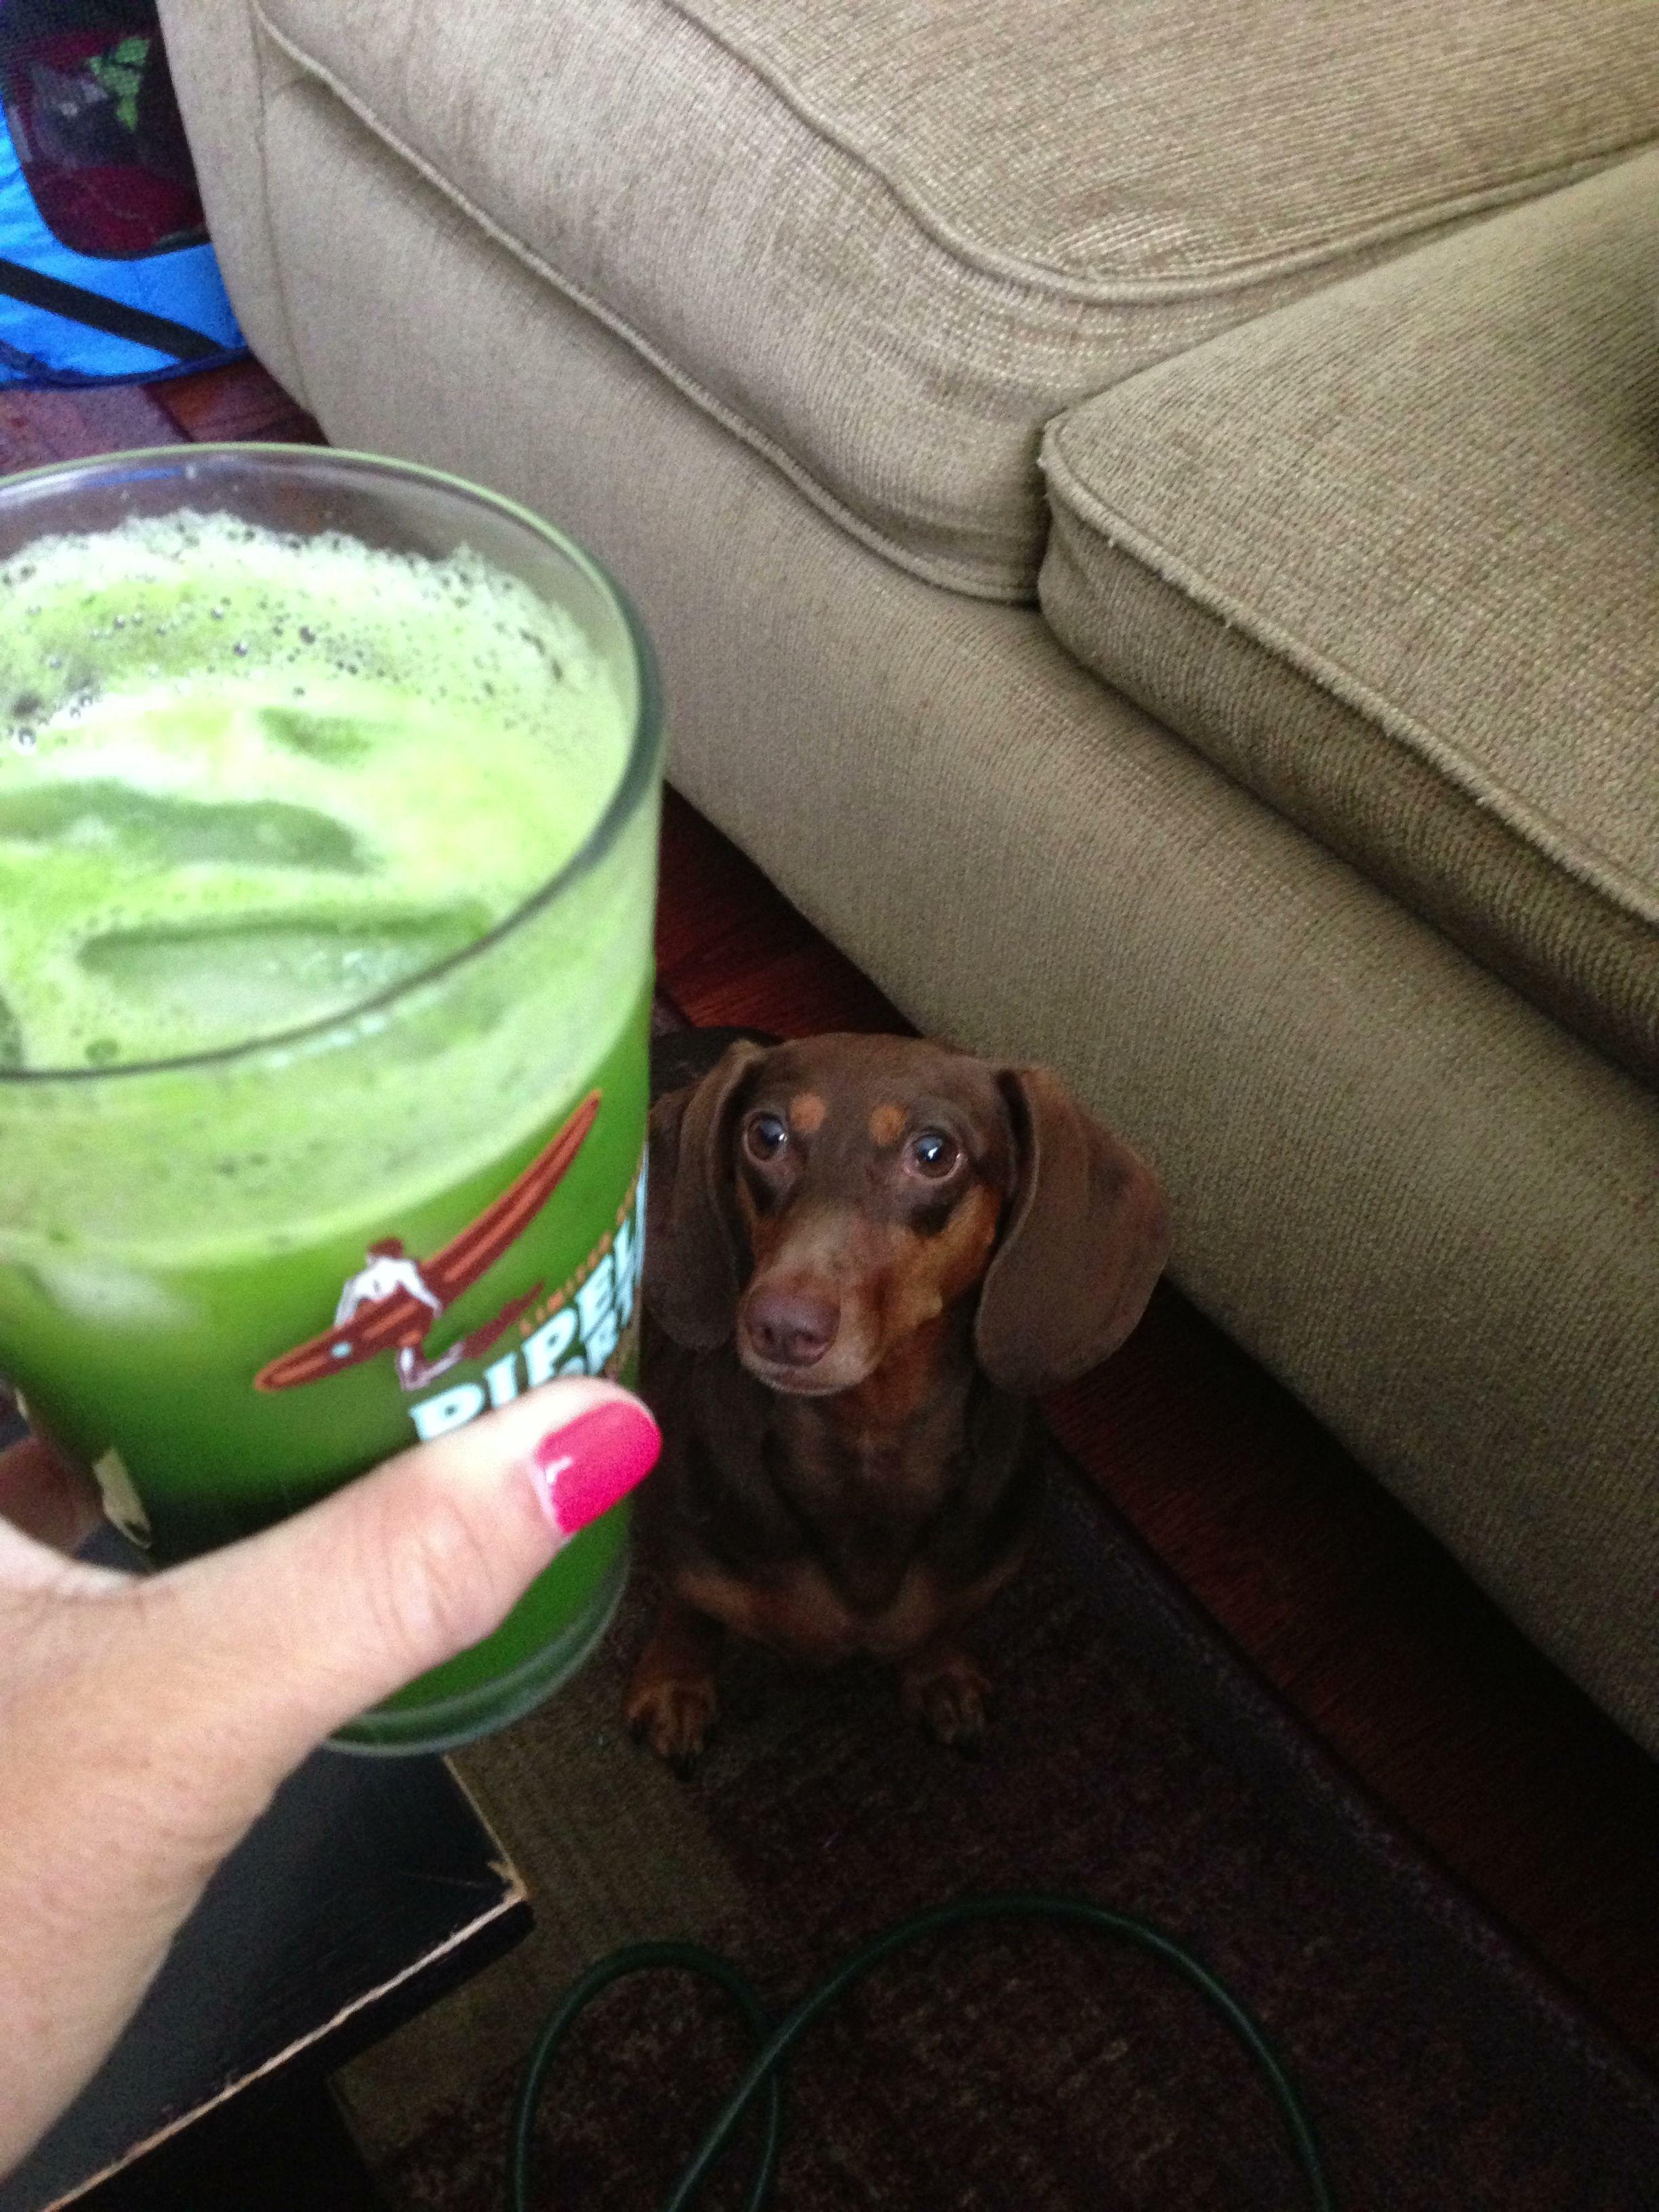 Dachshund Staring At Cake I Mean Green Juice Dachshund Love